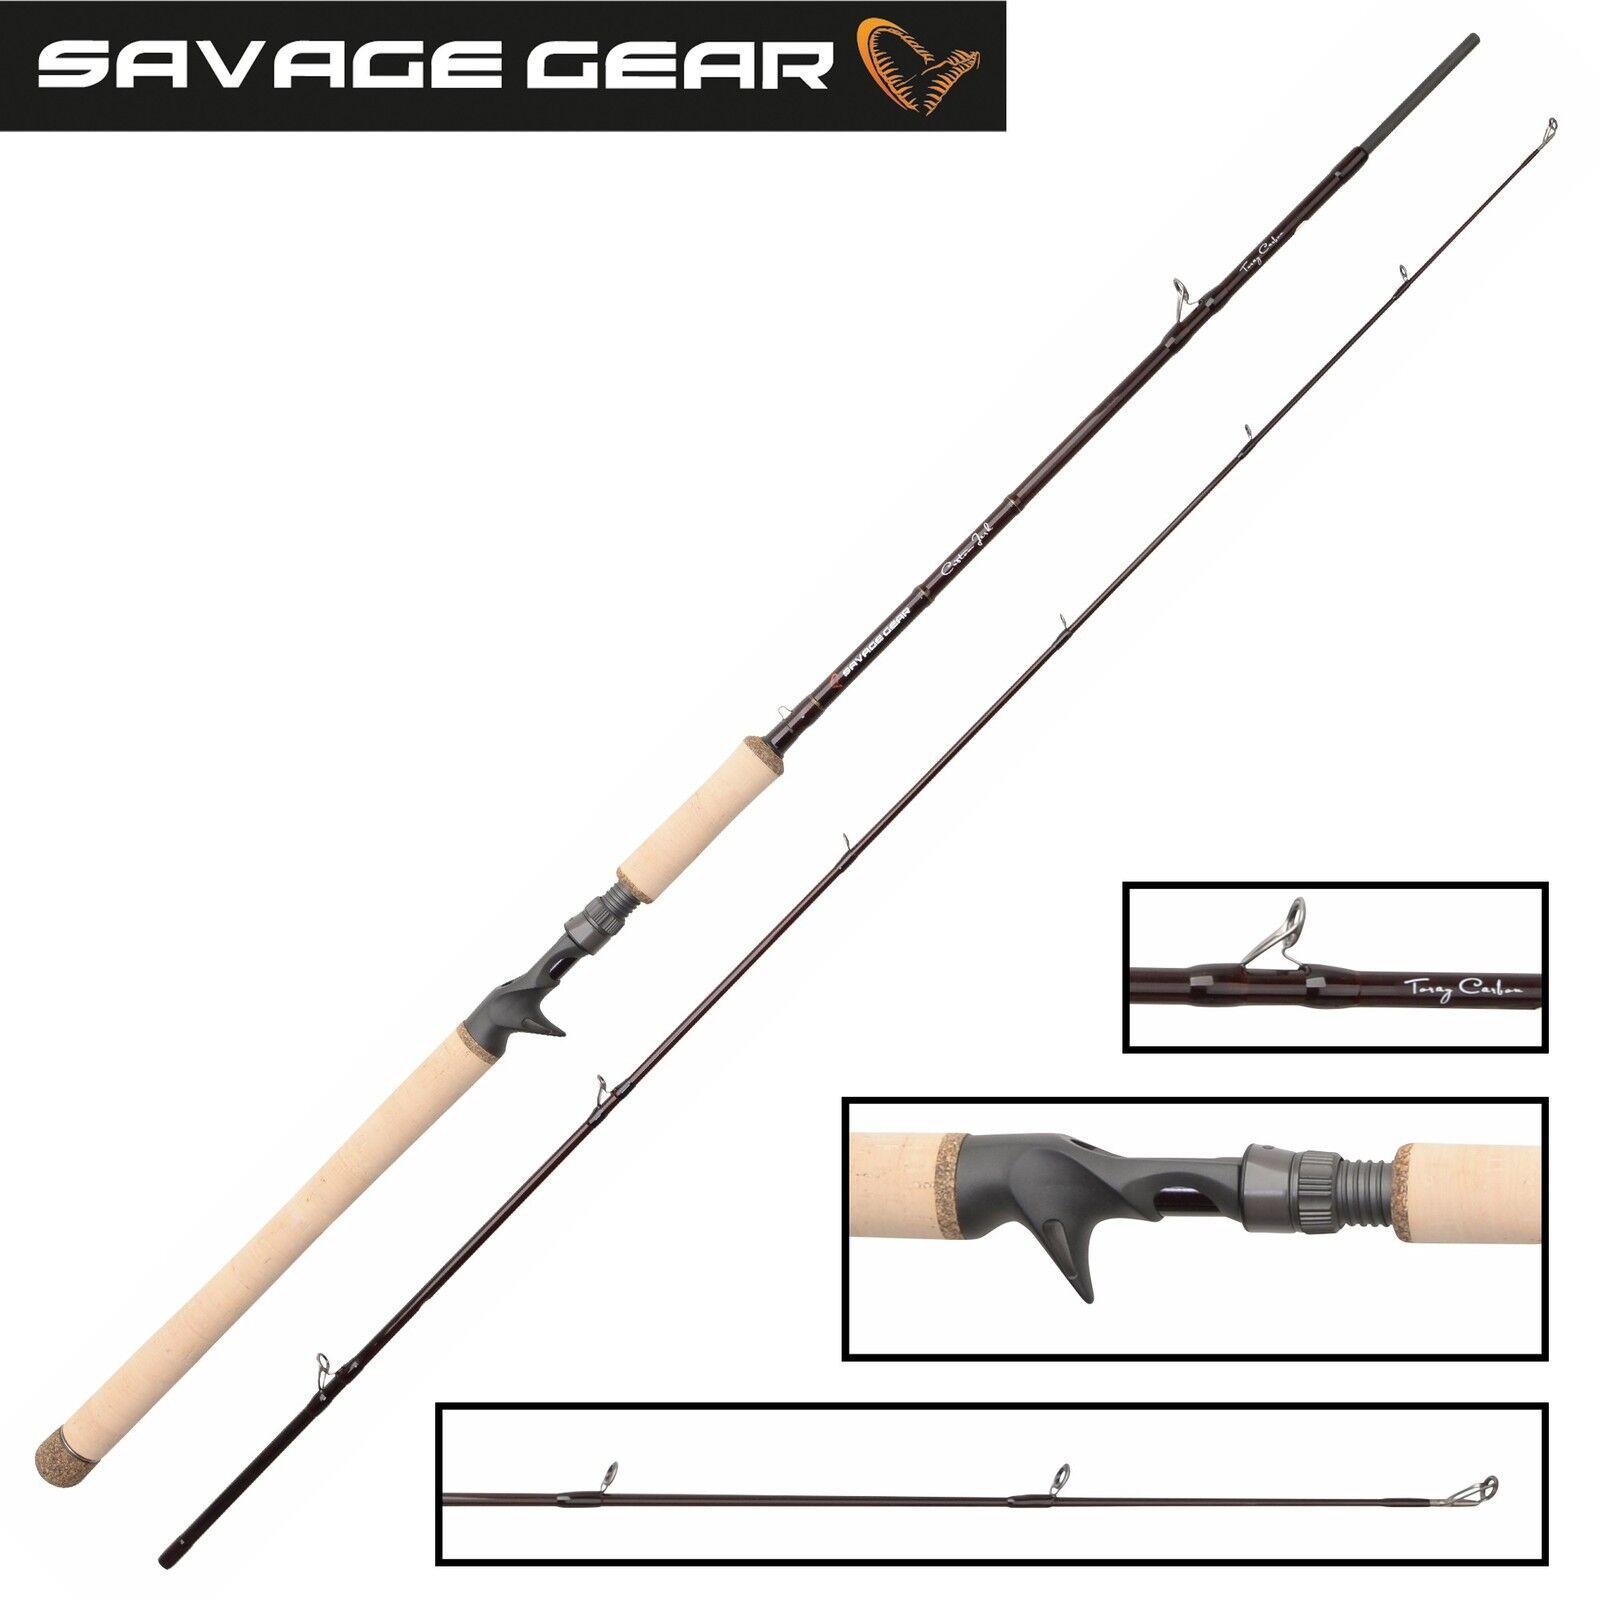 Savage Gear Custom Jerk 203cm 125g Jerkrute, Jerkrute, Jerkrute, Hechtrute für Jerkbaits und Wobbler 4c17f3